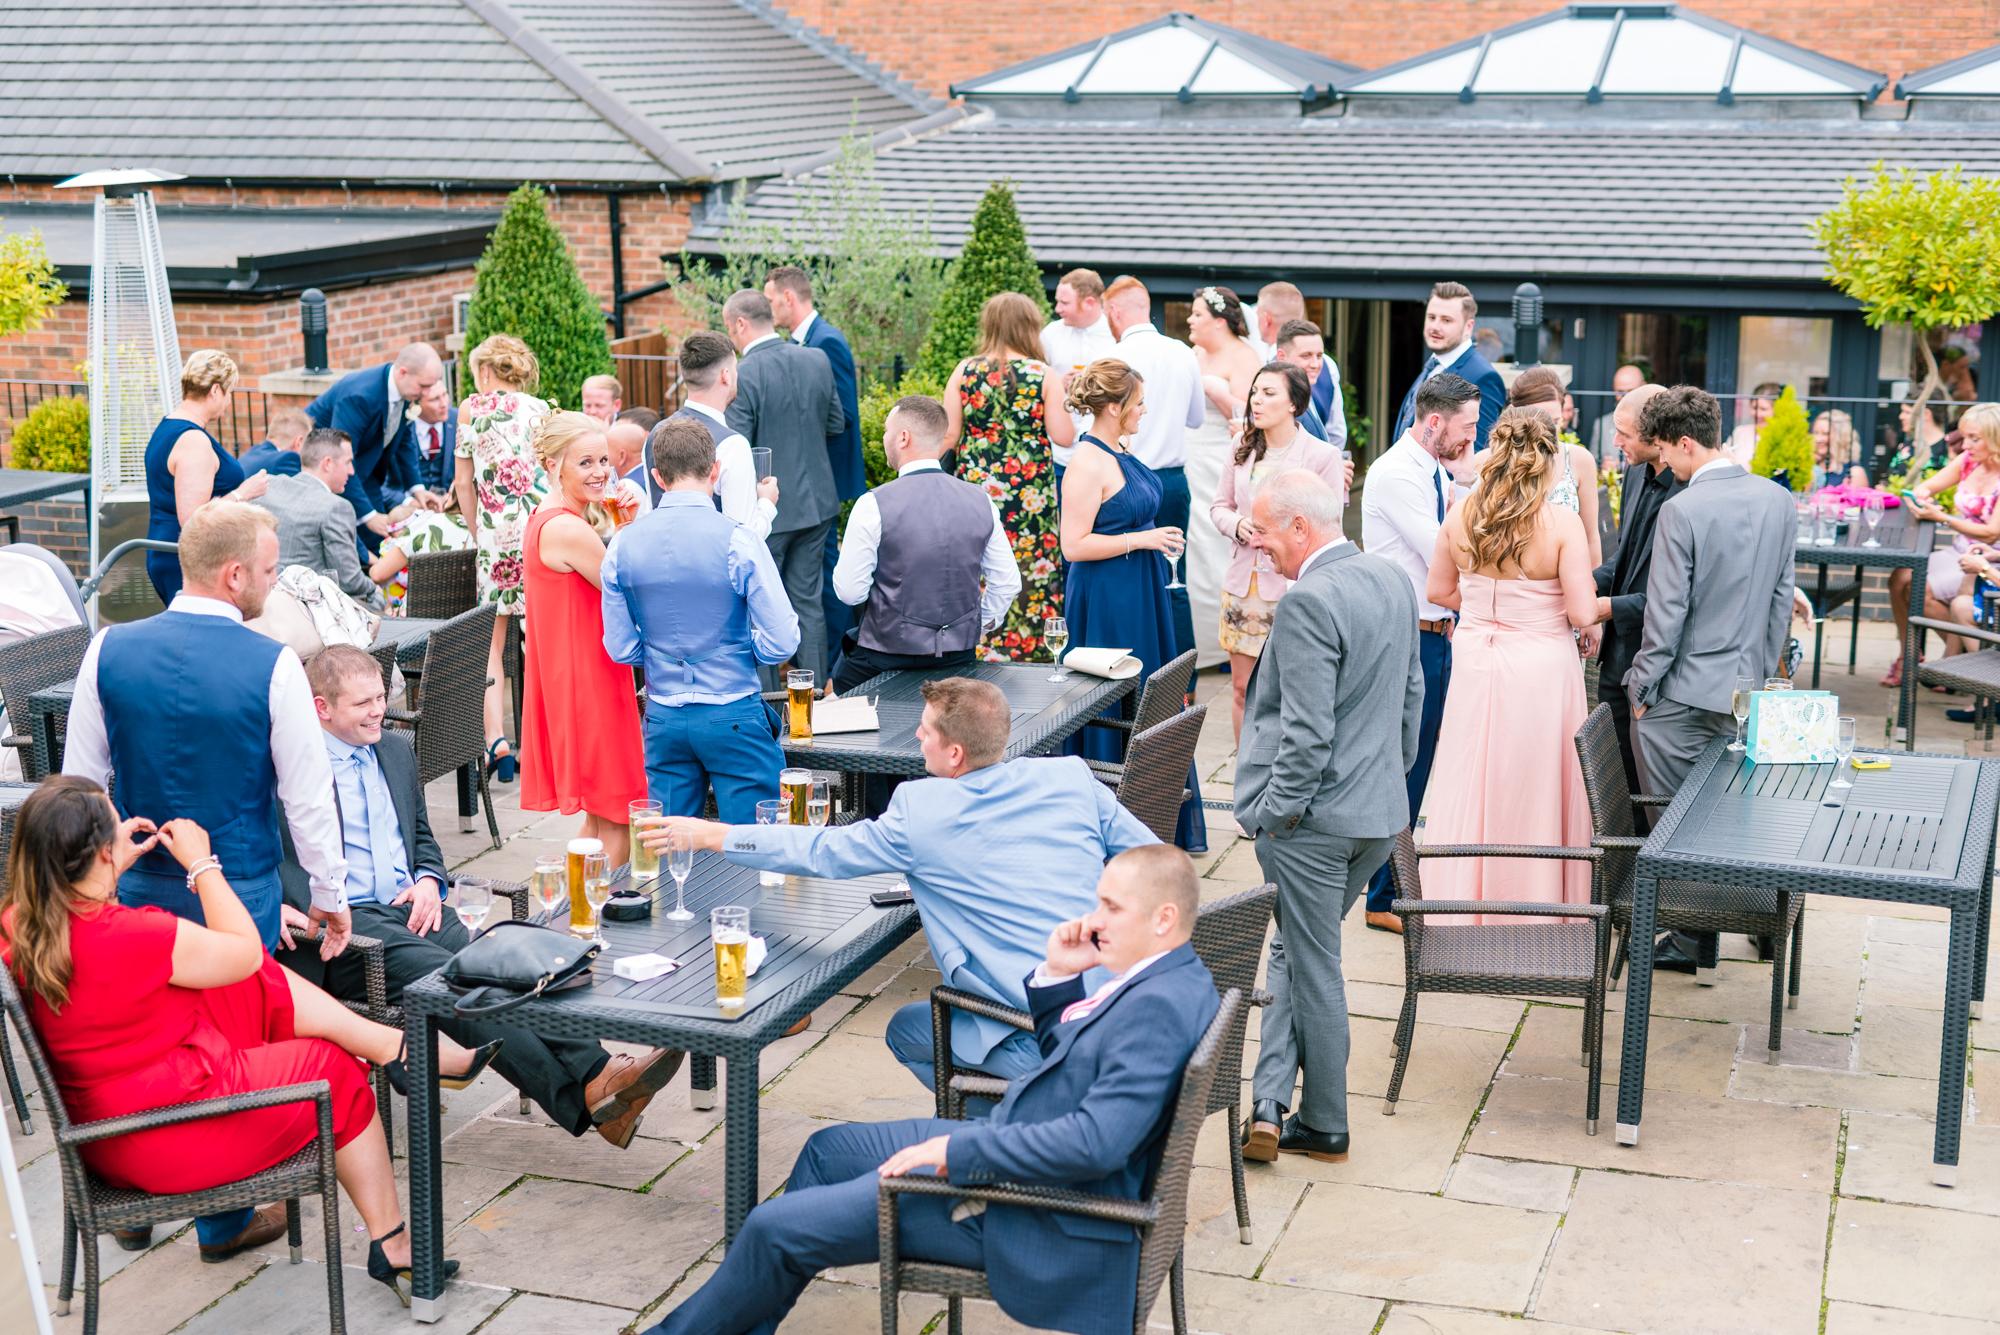 wedding guests outside enjoying a summer evening